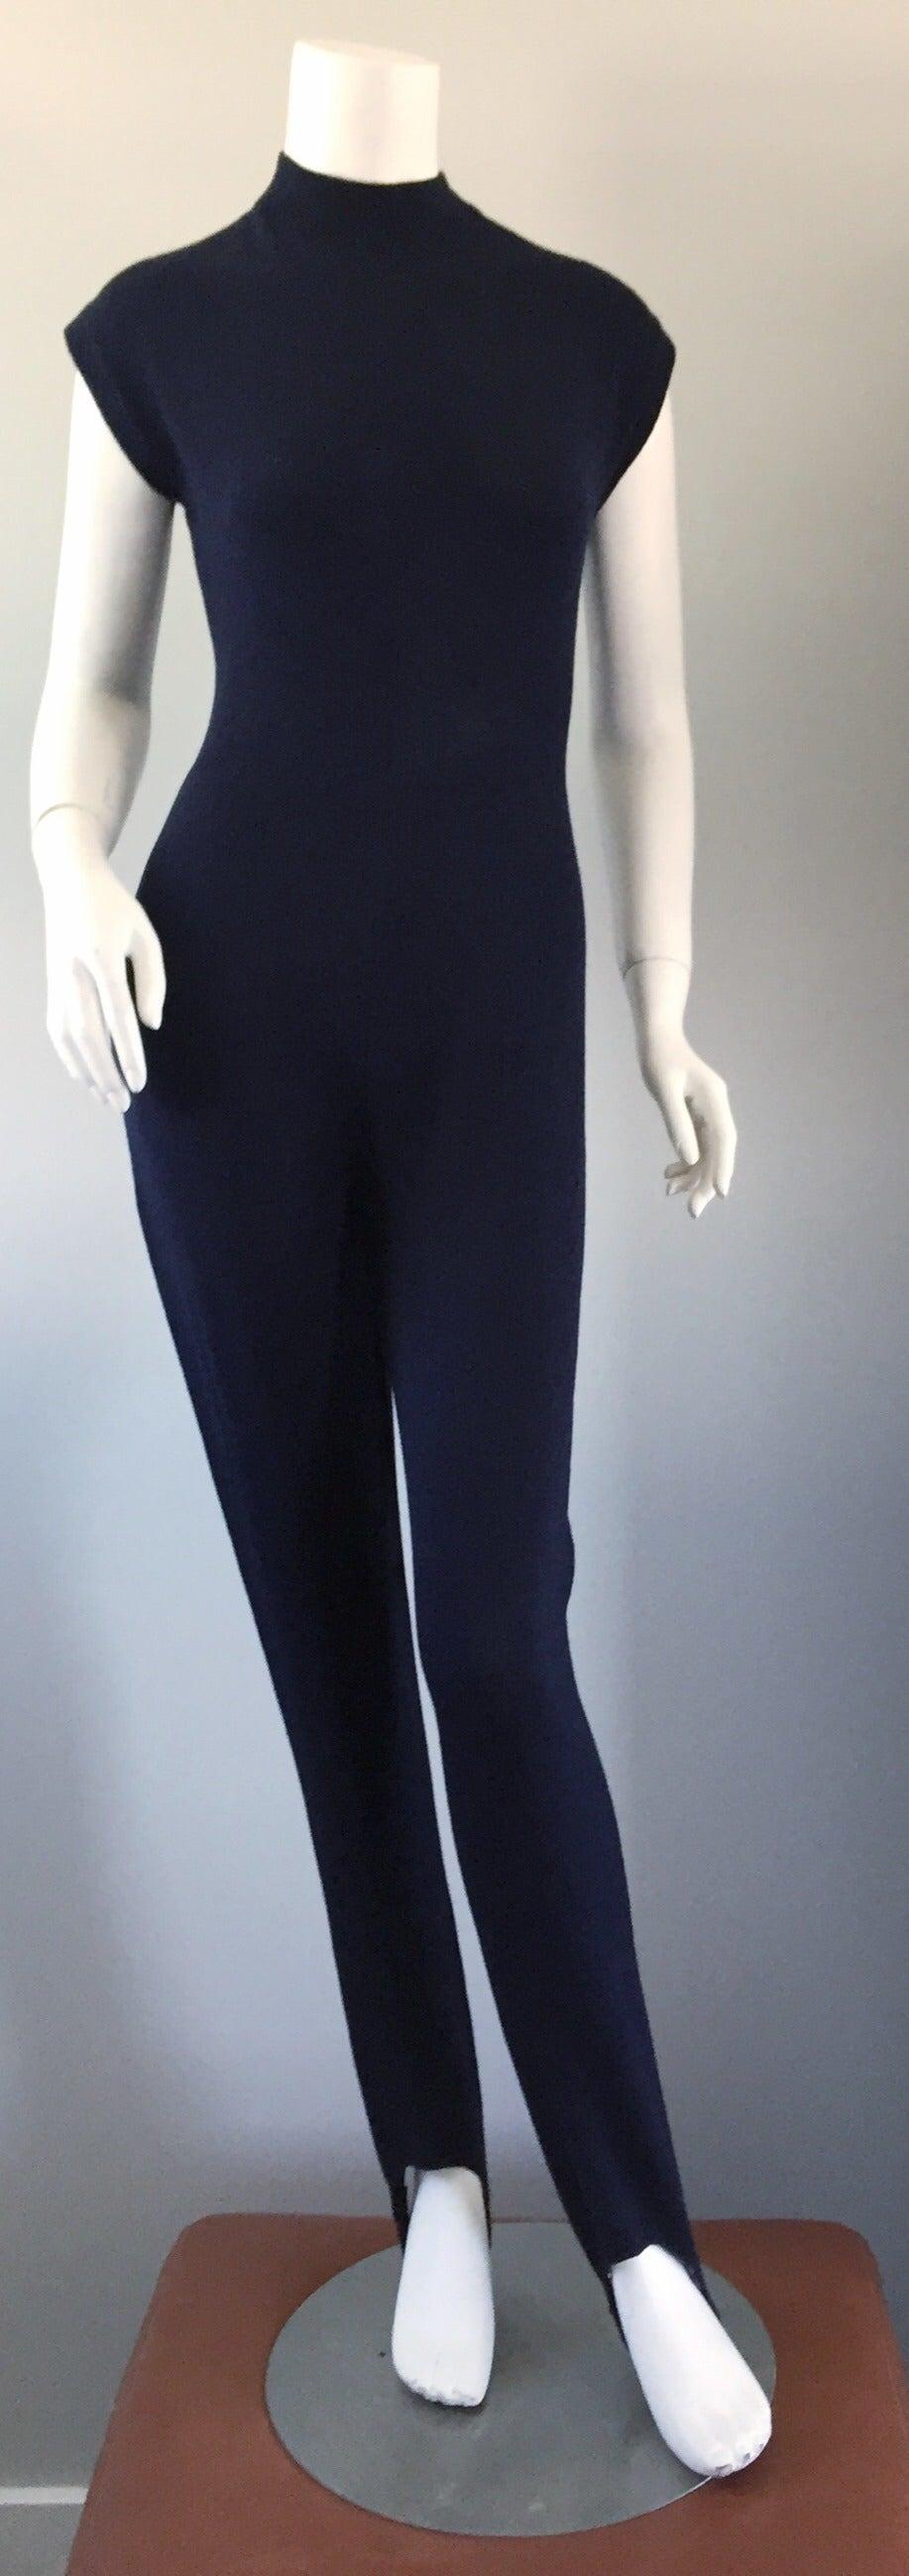 68e61c333f91 Vintage St. John by Marie Gray Navy Blue Santana Knit Jumpsuit w ...